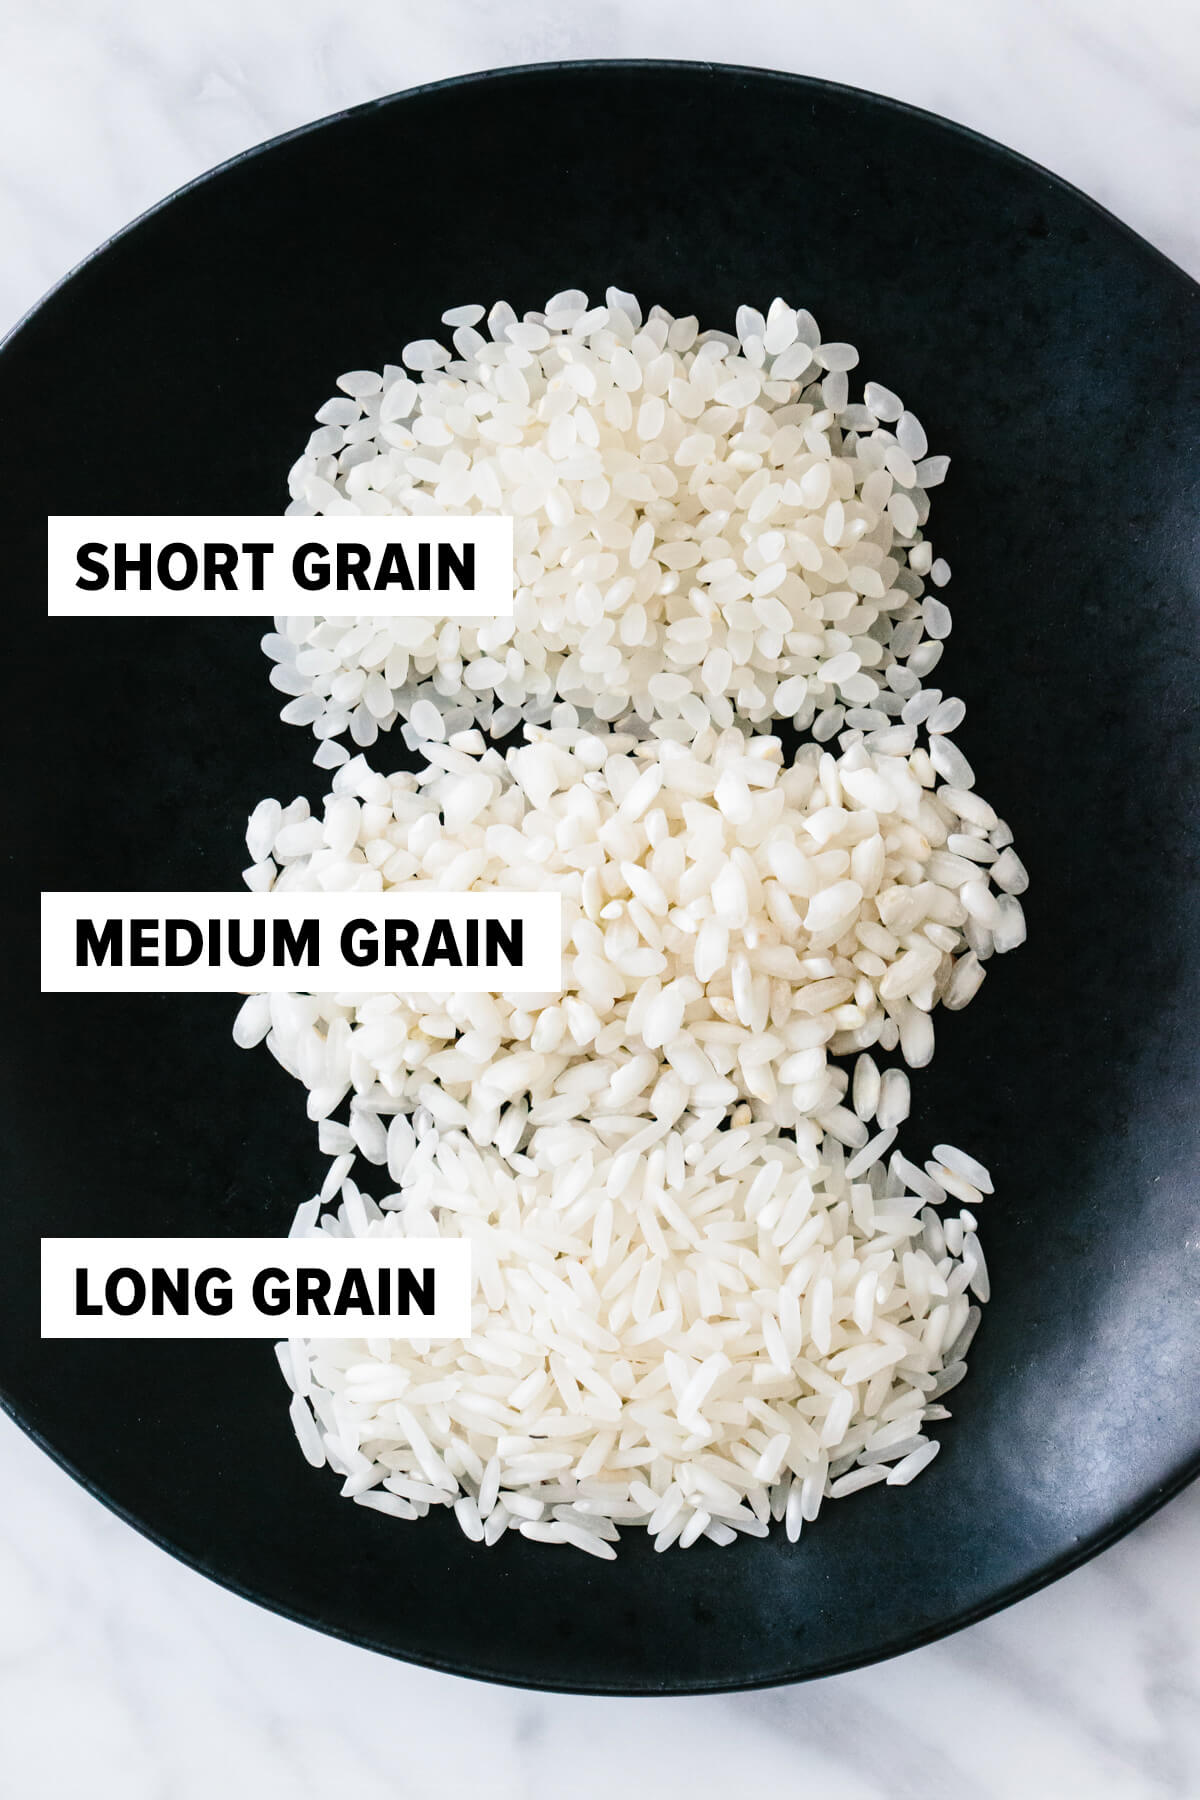 Short grain, medium grain and long grain rice on a plate.